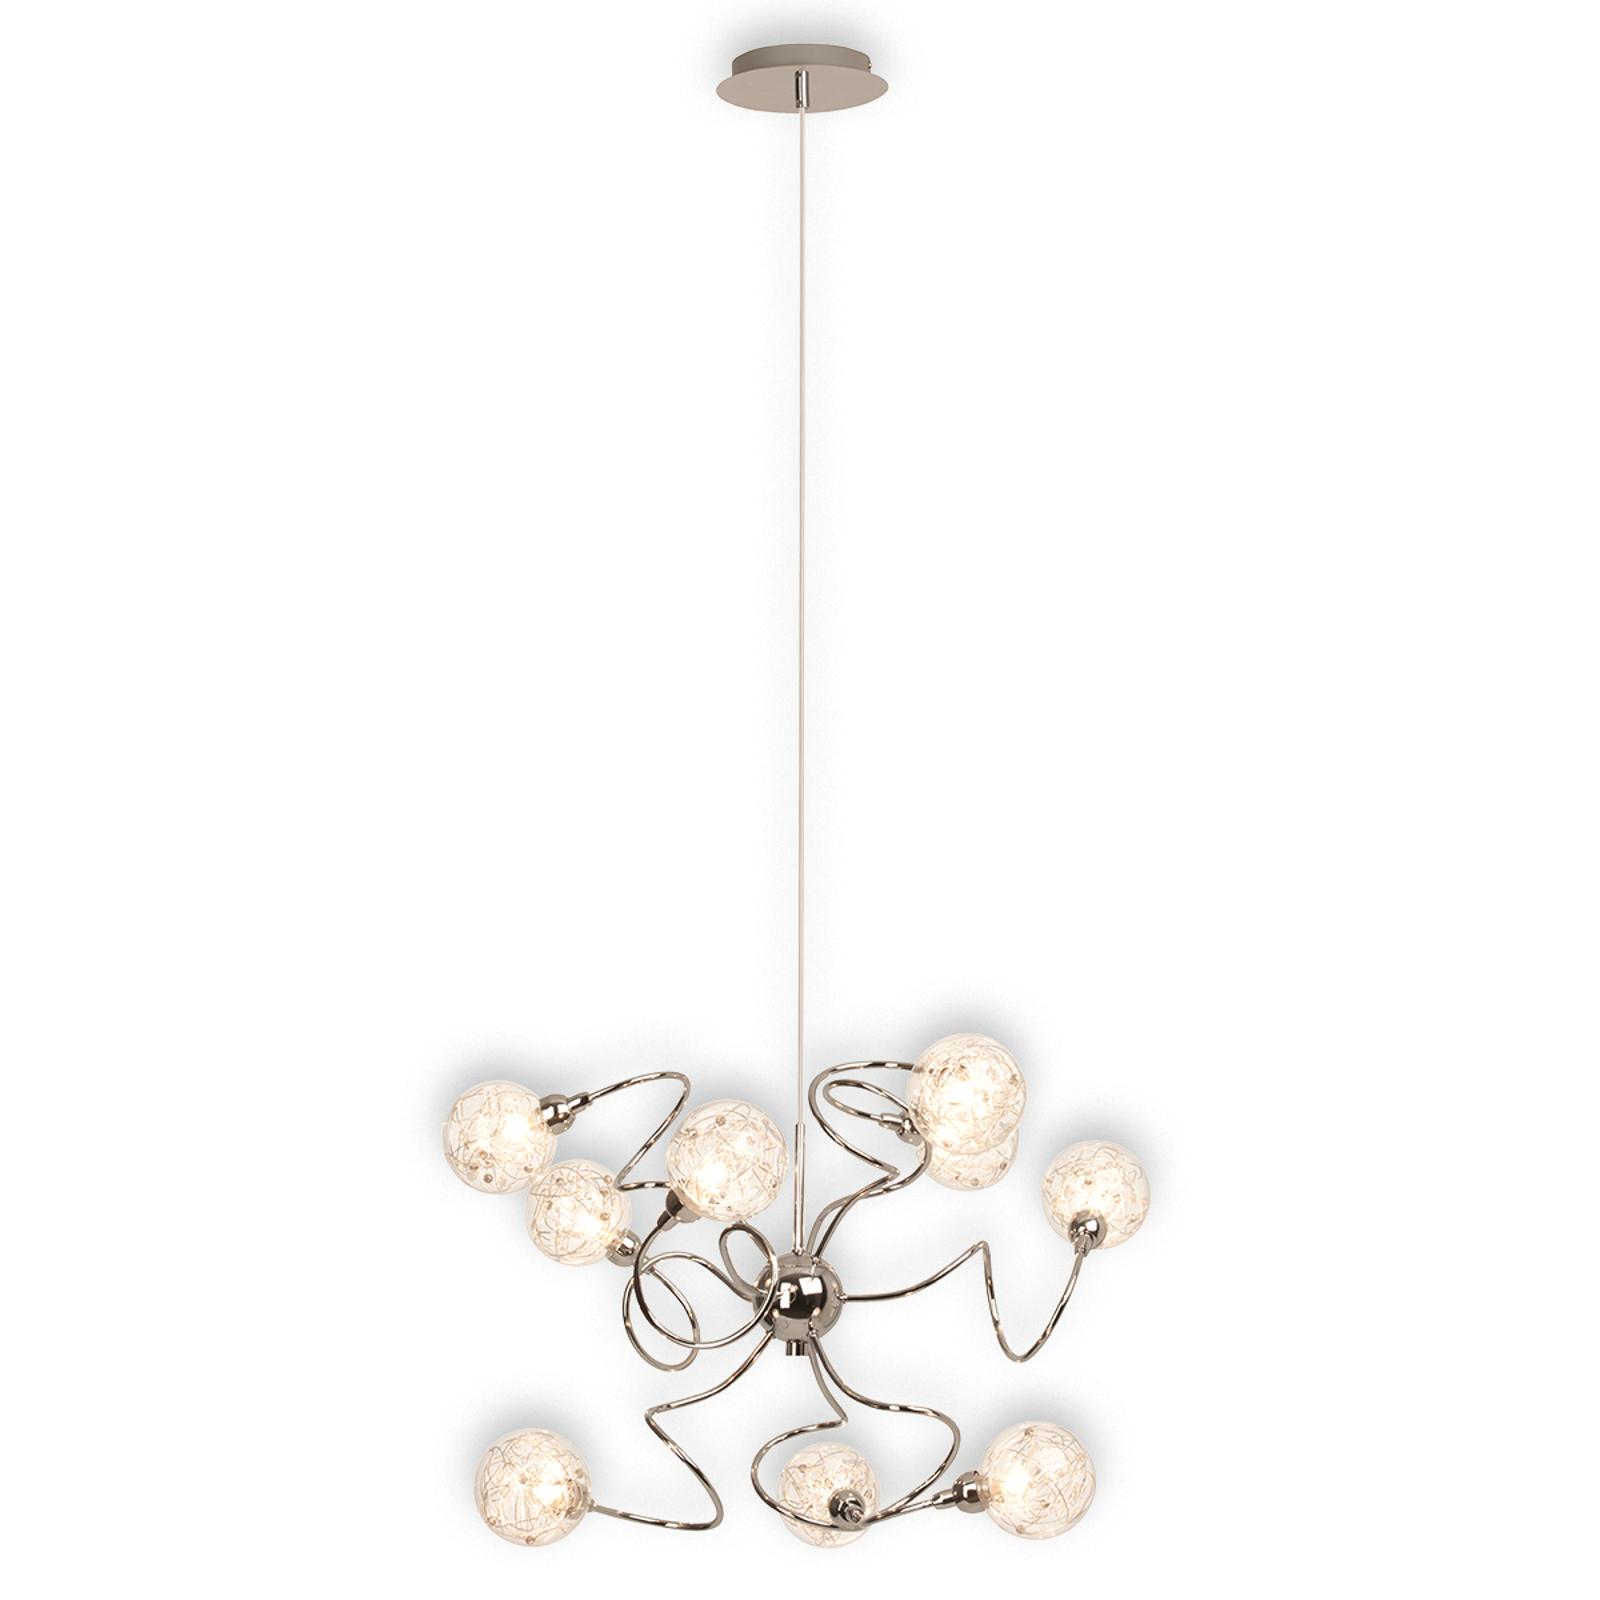 Joya - originale lampada a sospensione a 9 luci